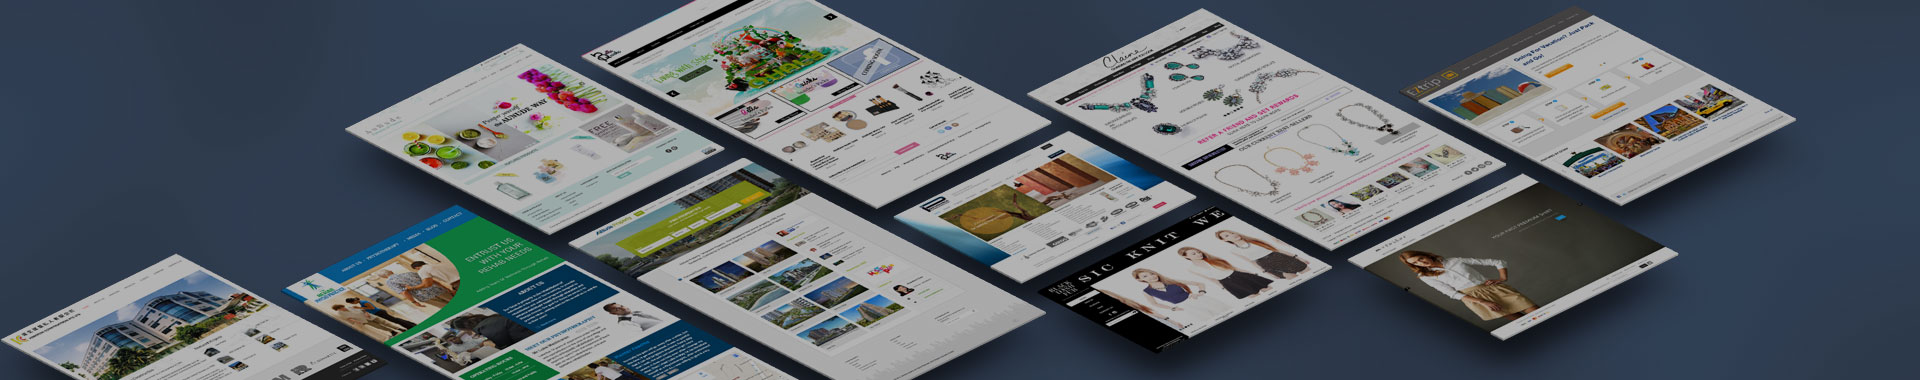 Website Design Singapore - The Rosette Label